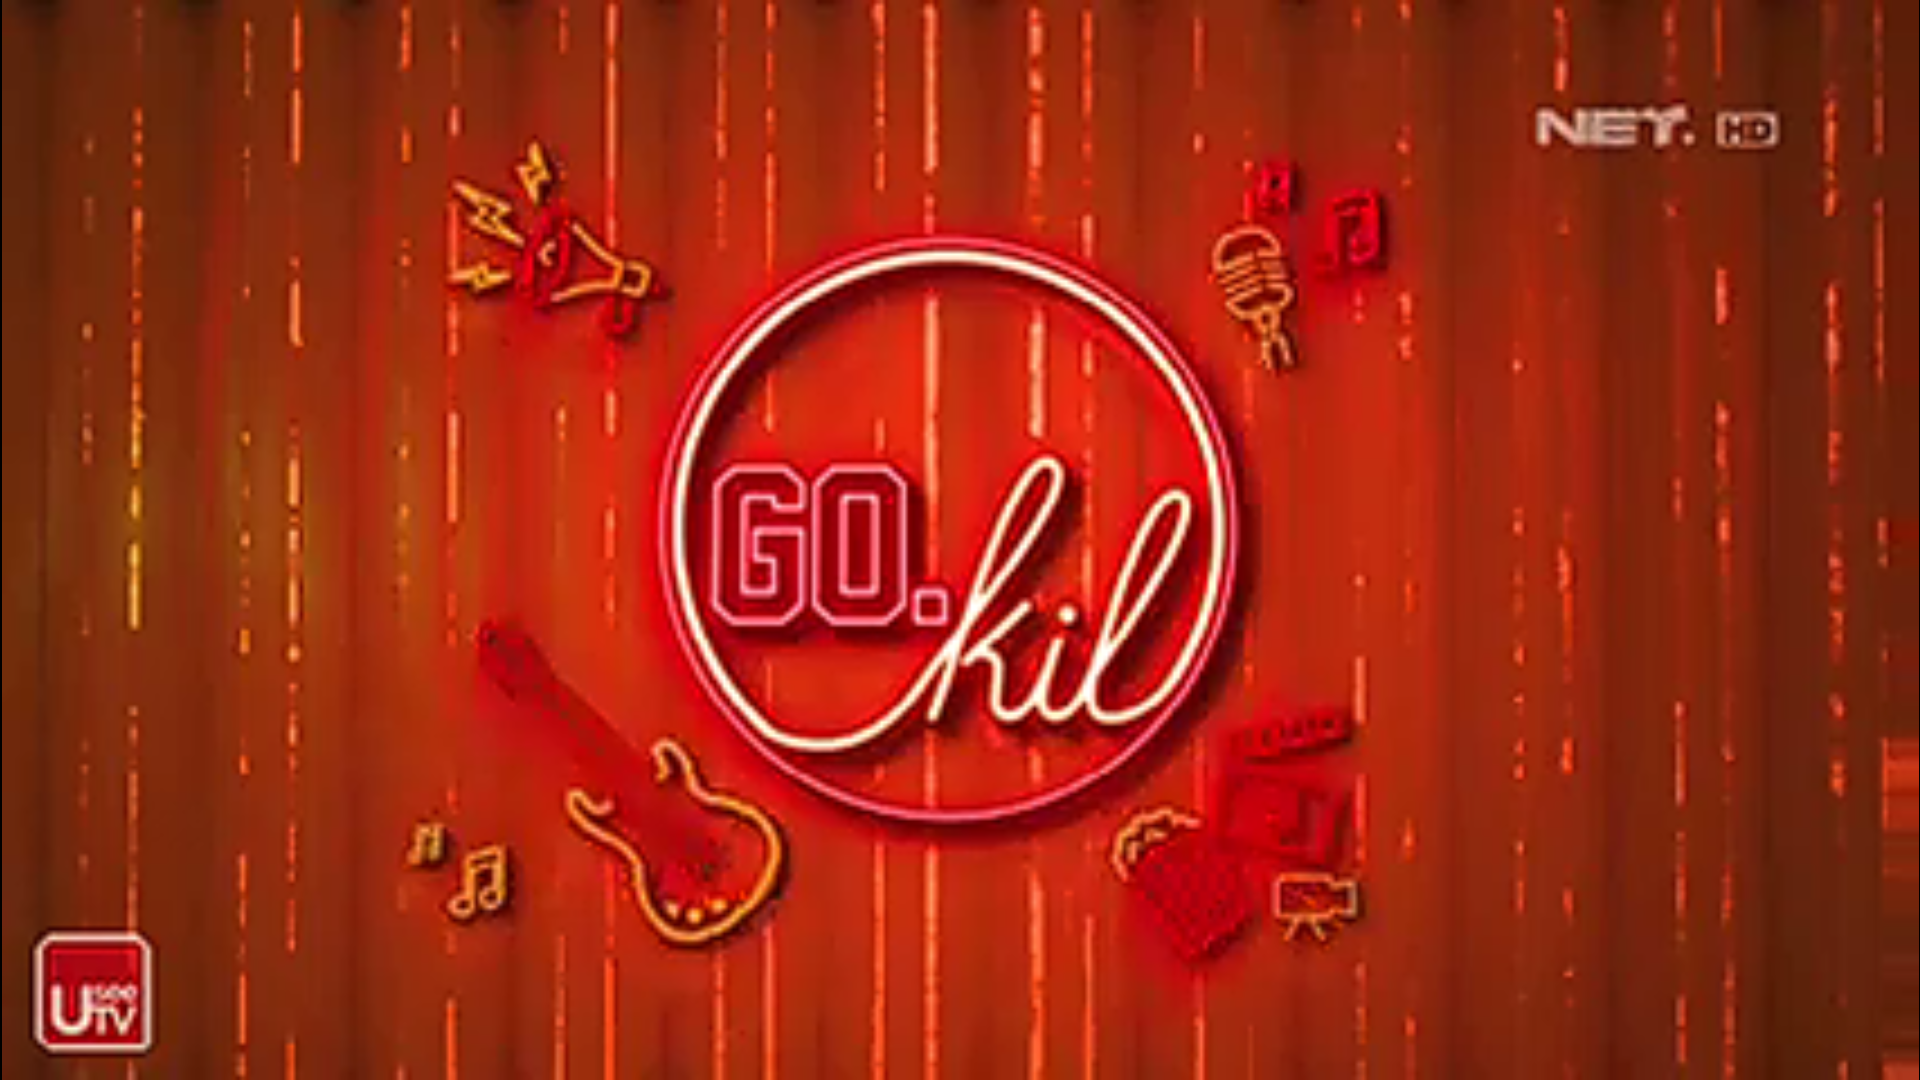 Gokil (2020 TV Series)